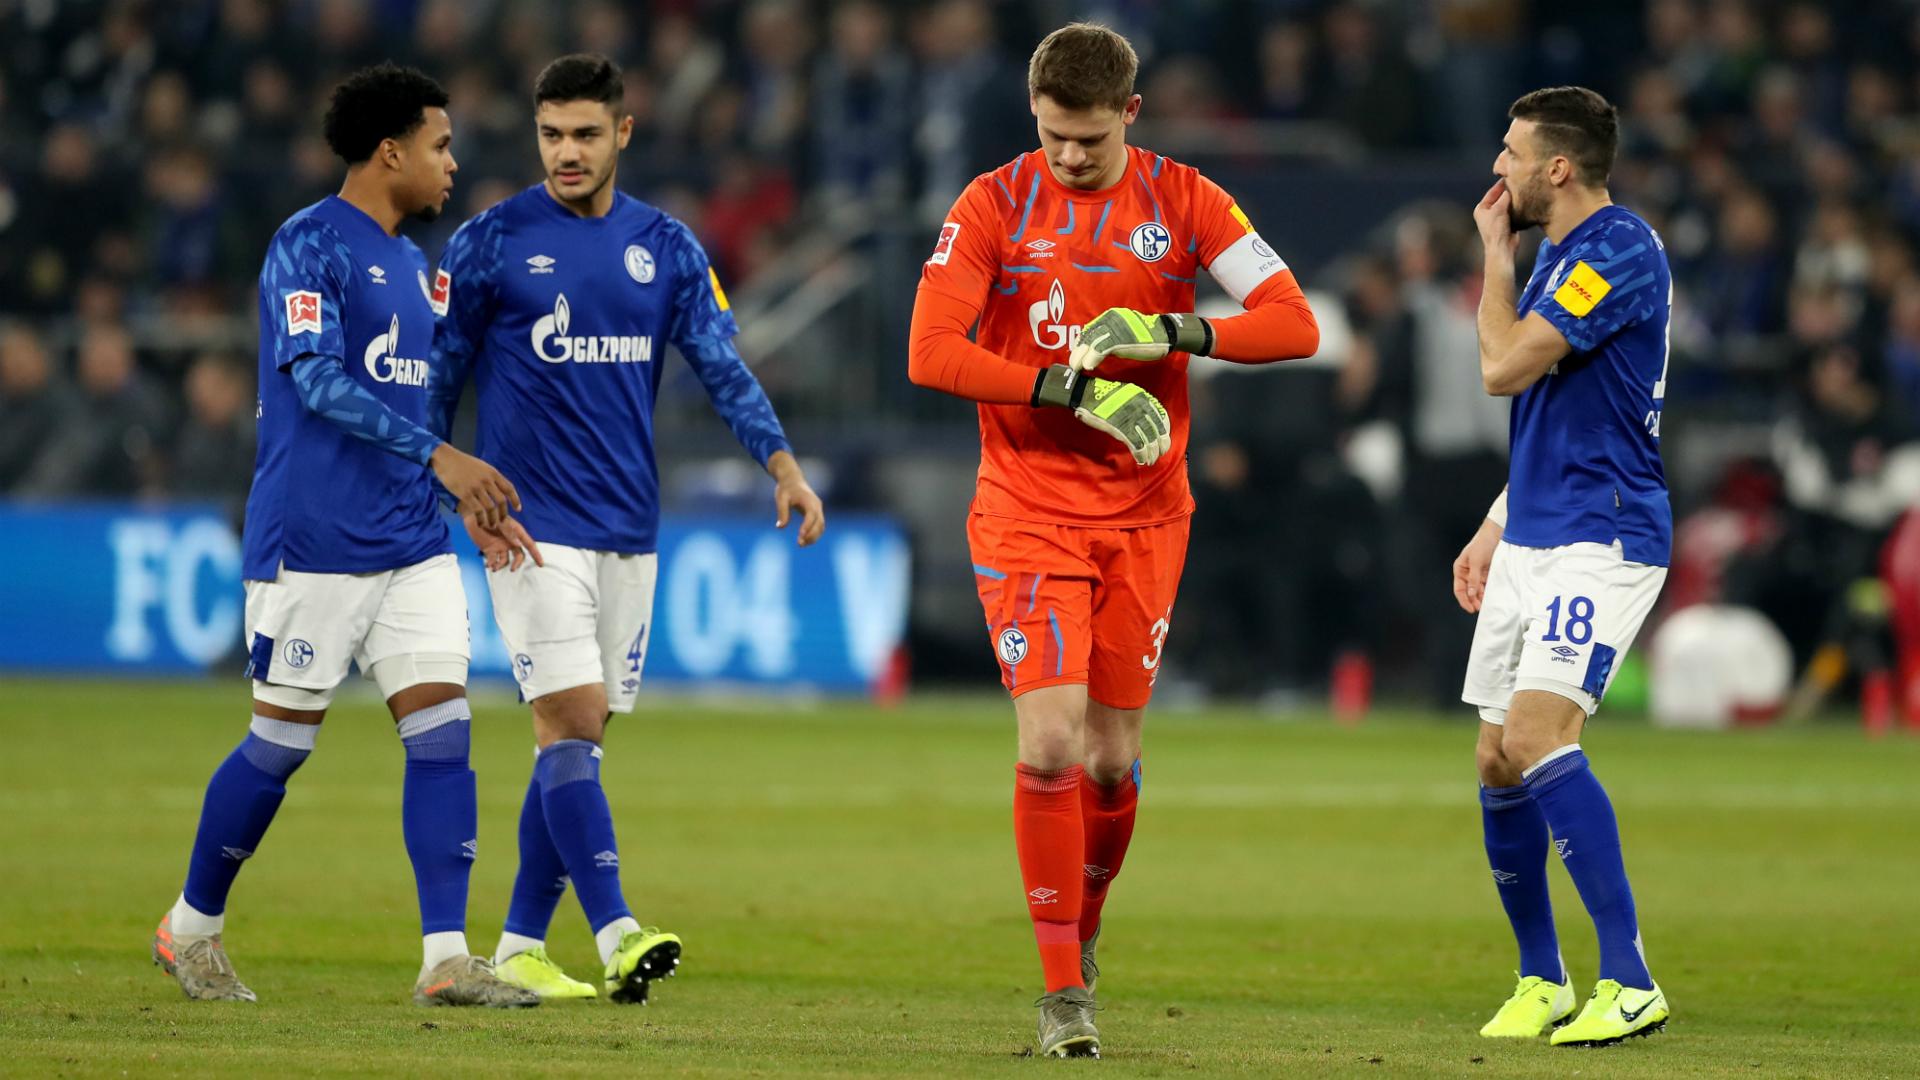 Nubel meant no harm with horror challenge on Gacinovic, insists Schalke boss Wagner